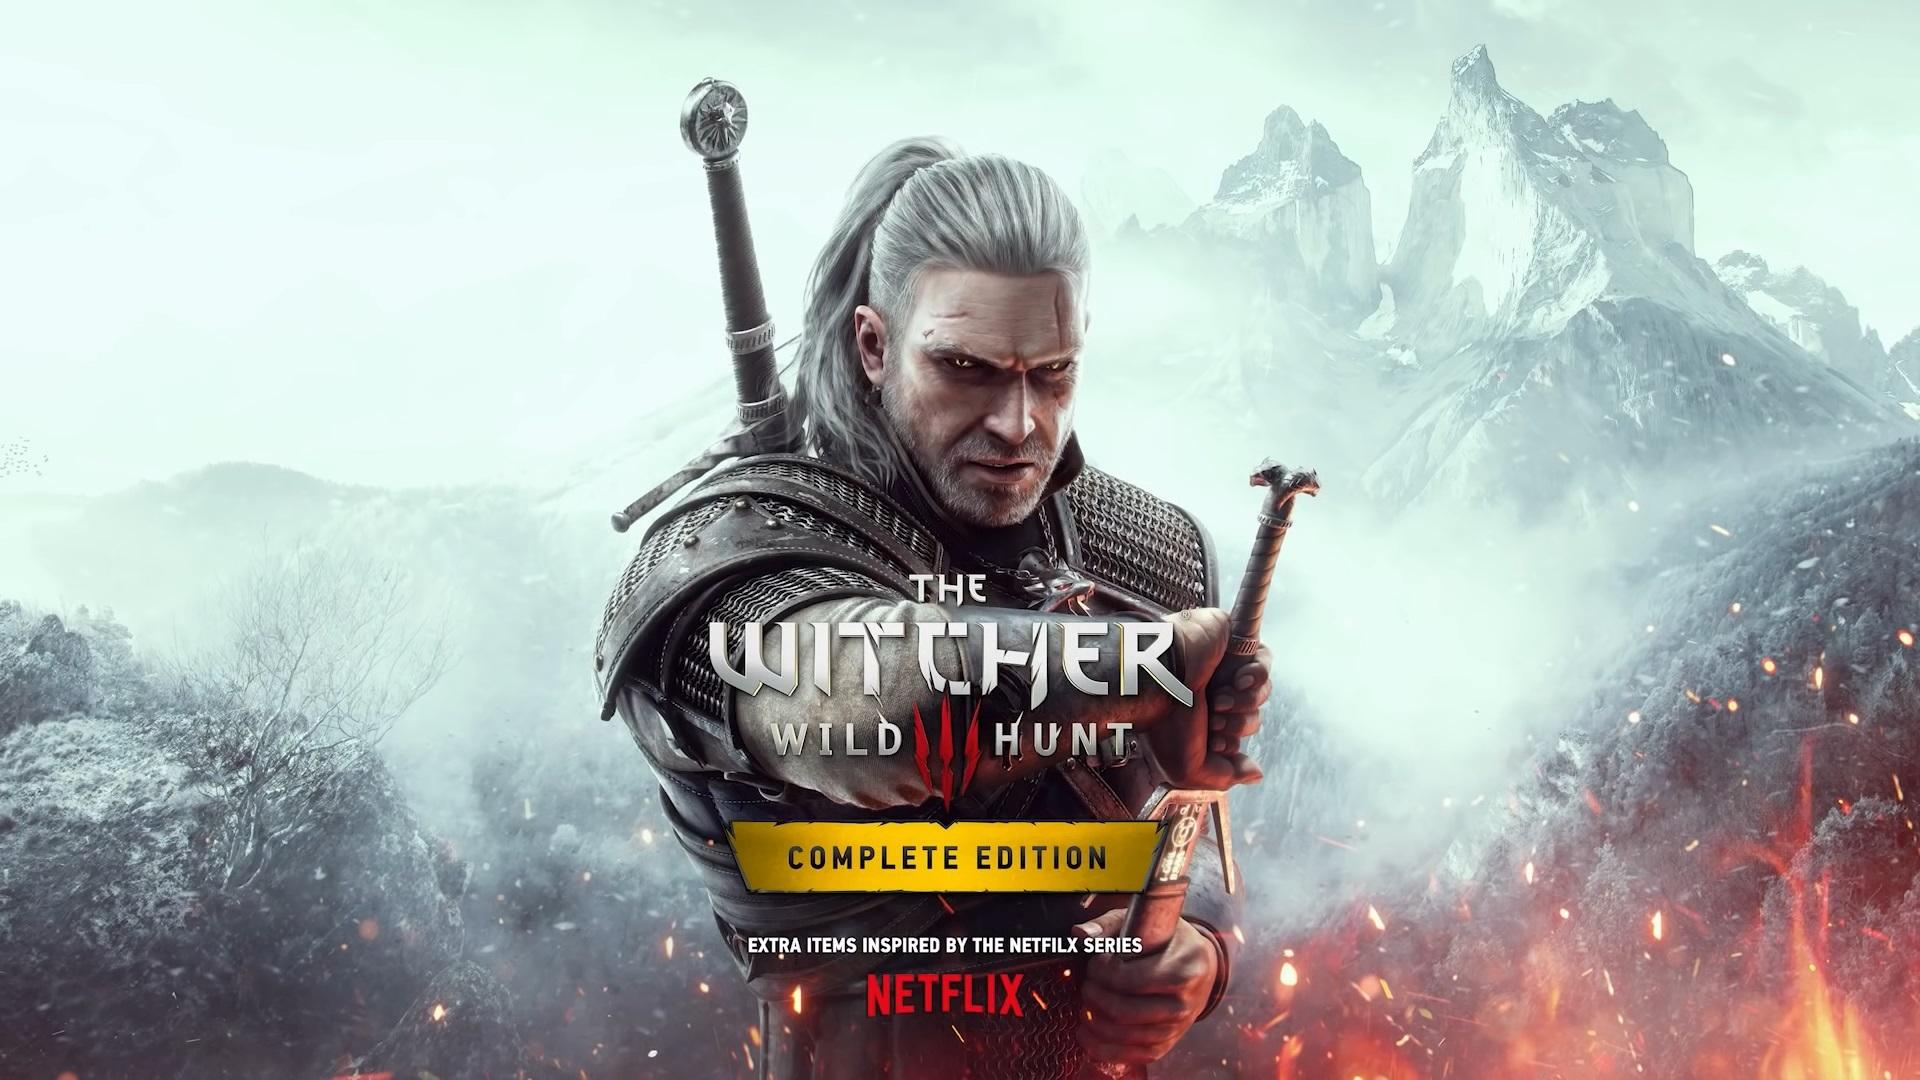 The Witcher 3 släpps till PS5 och Xbox Series S/X under våren